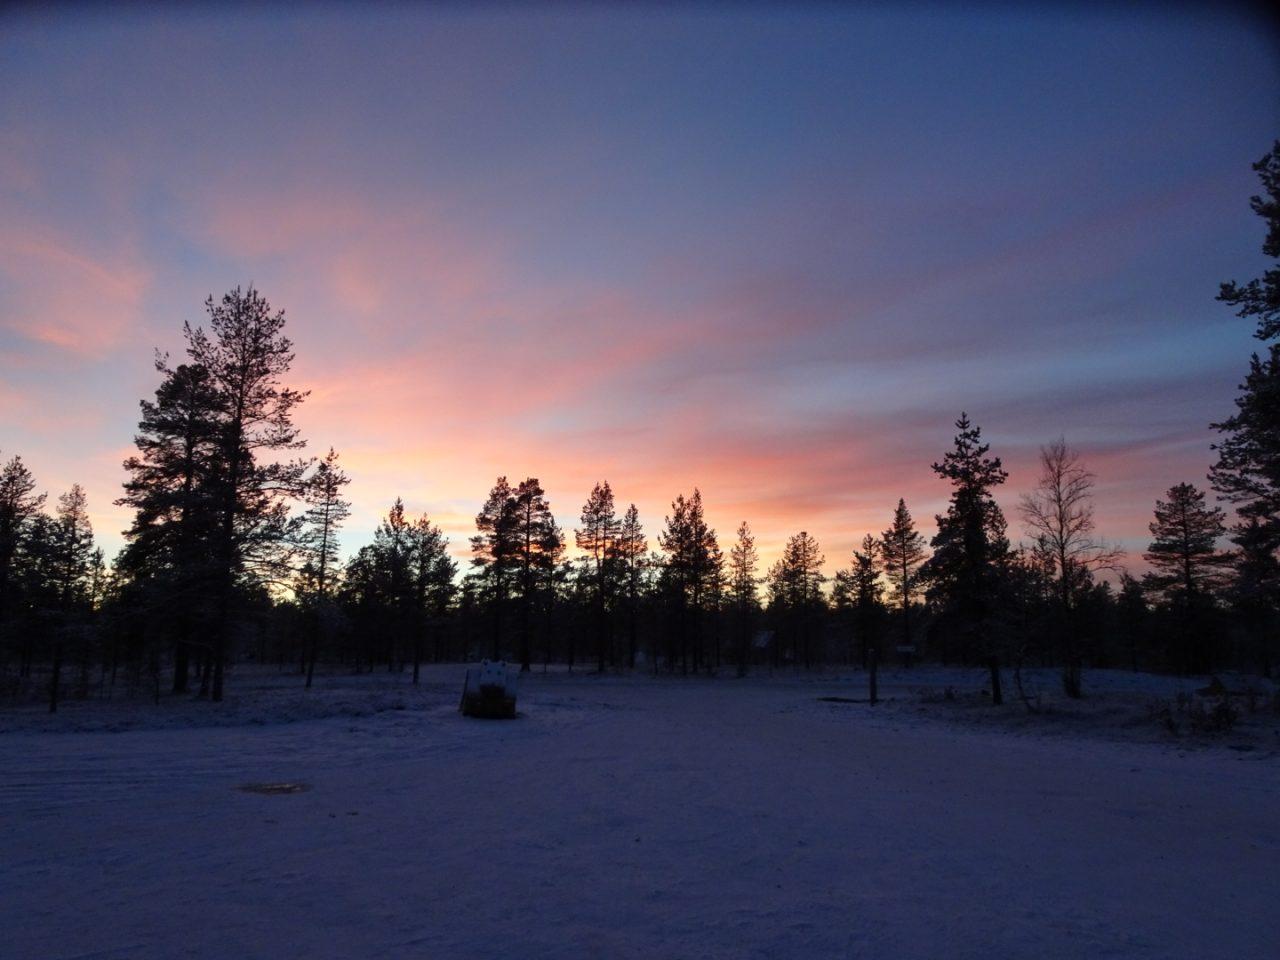 Finnish Lapland sunset